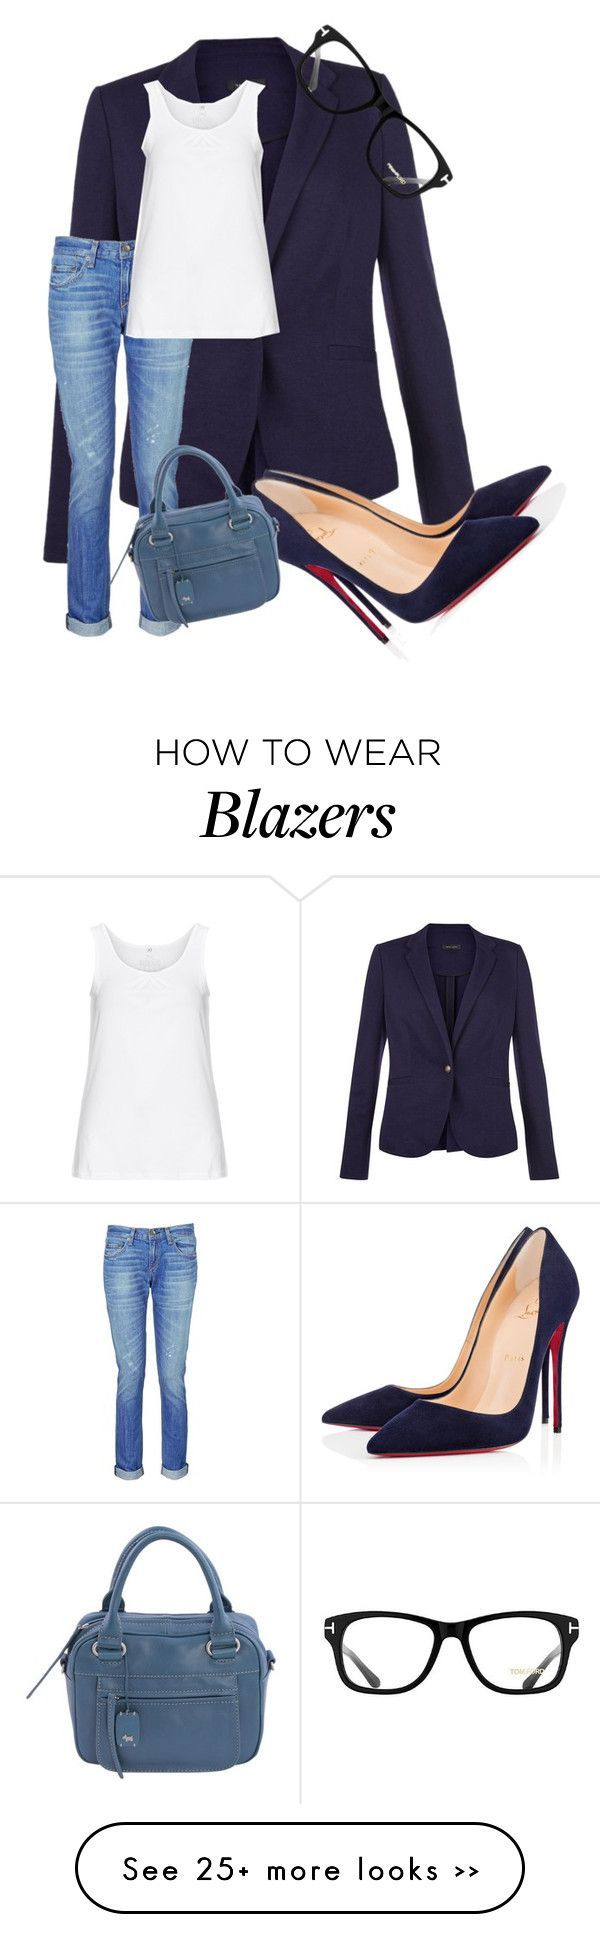 Blazers Sets